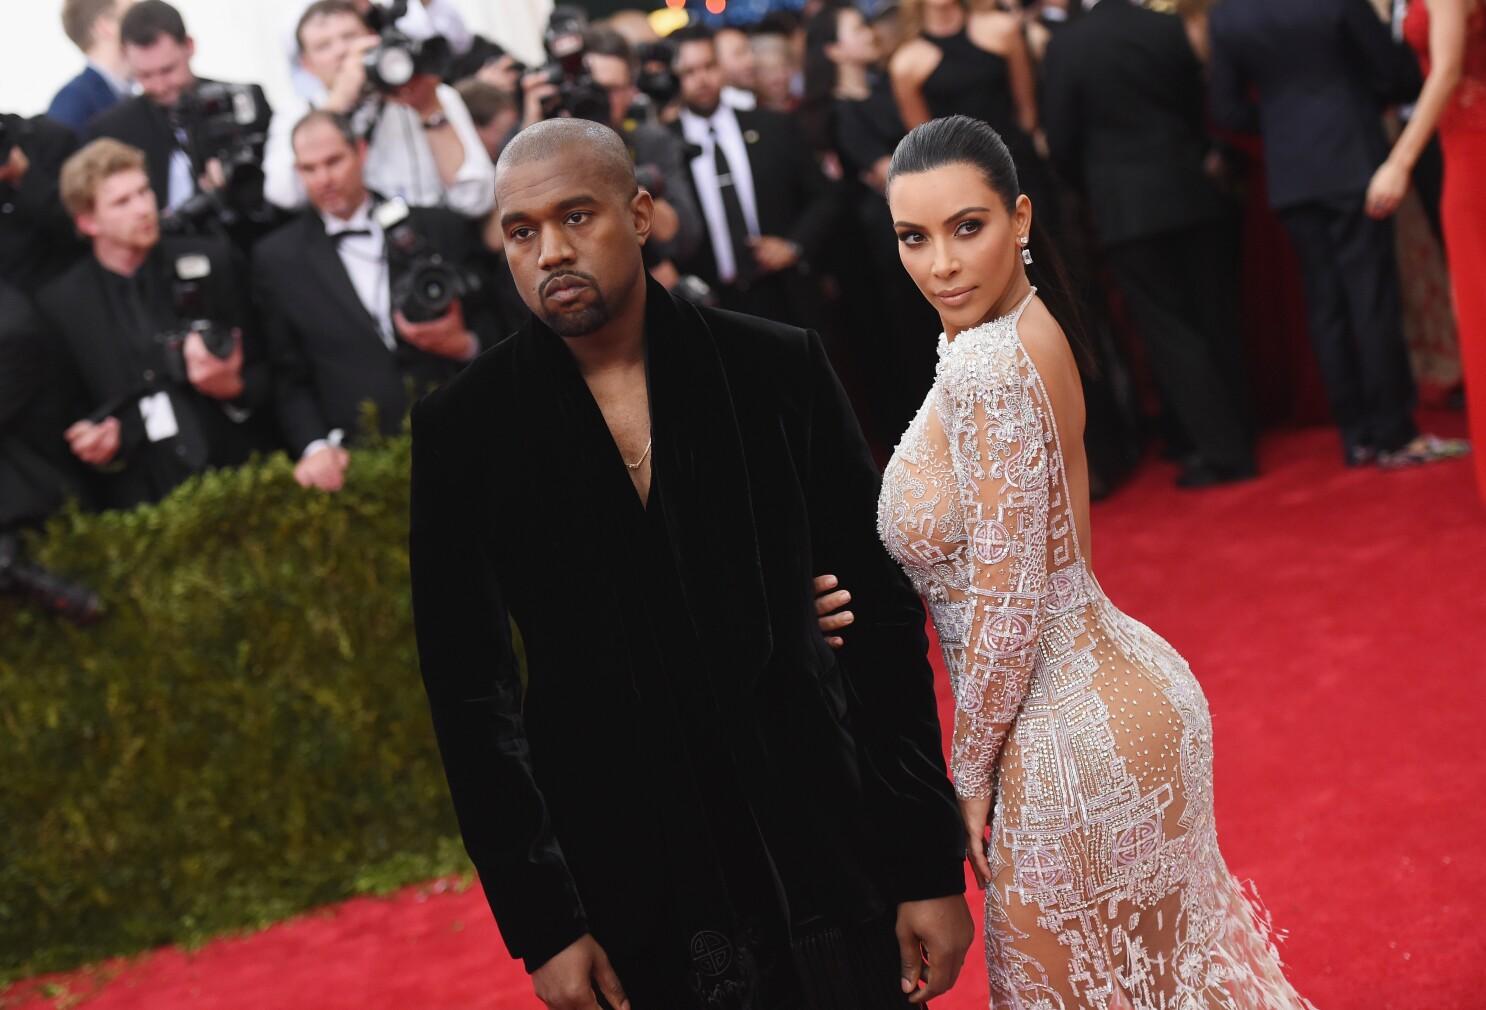 Kim Kardashian Divorces Kanye West What We Know So Far The San Diego Union Tribune